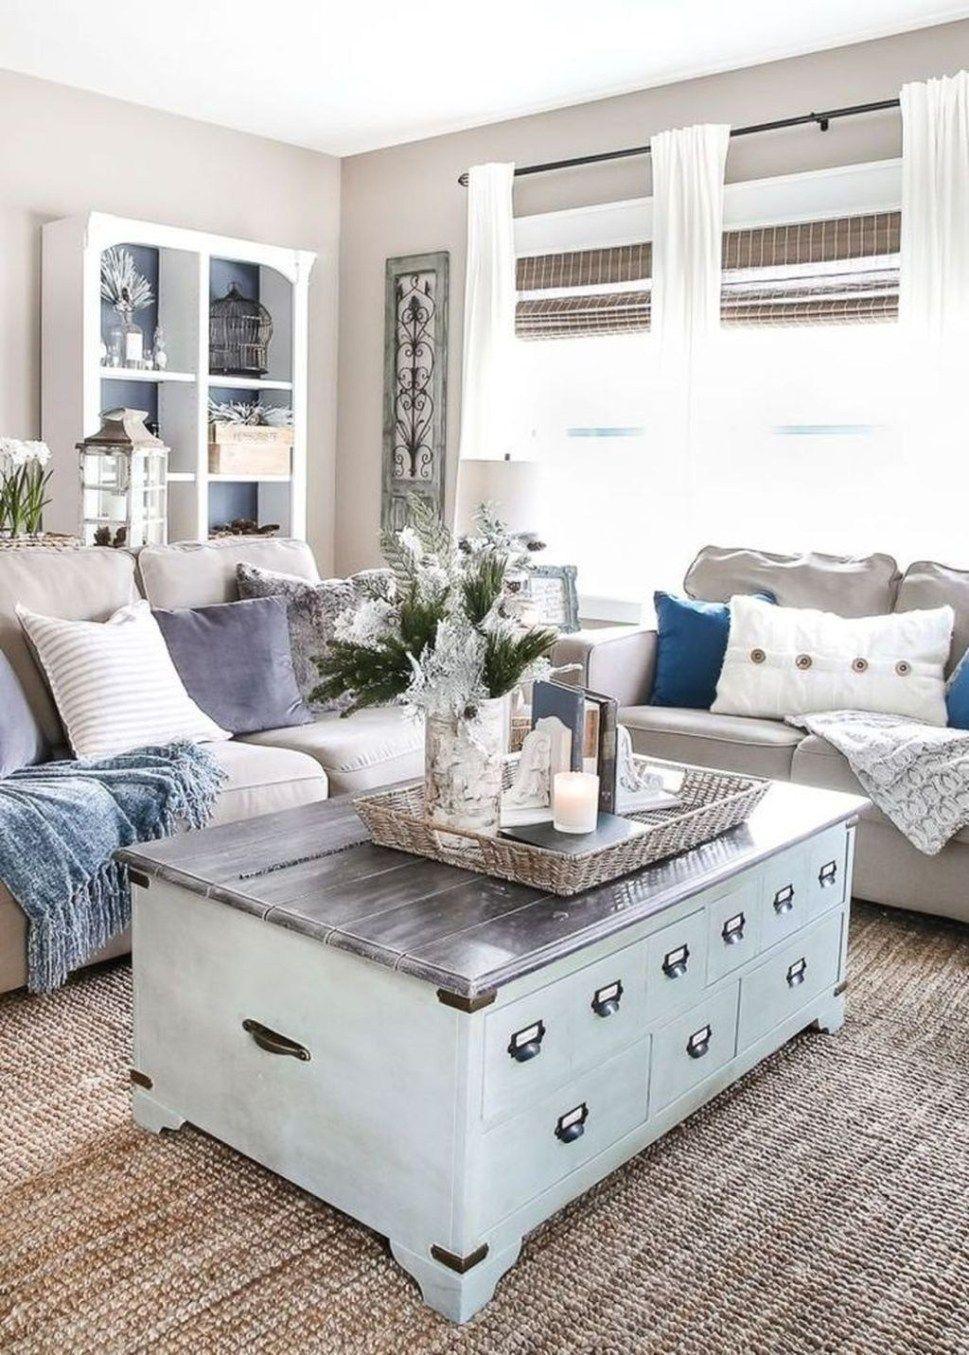 42 Ideas For Living Room Small Rustic Beams Livingroom: 42 Cozy Bohemian Farmhouse Decorating Ideas For Living